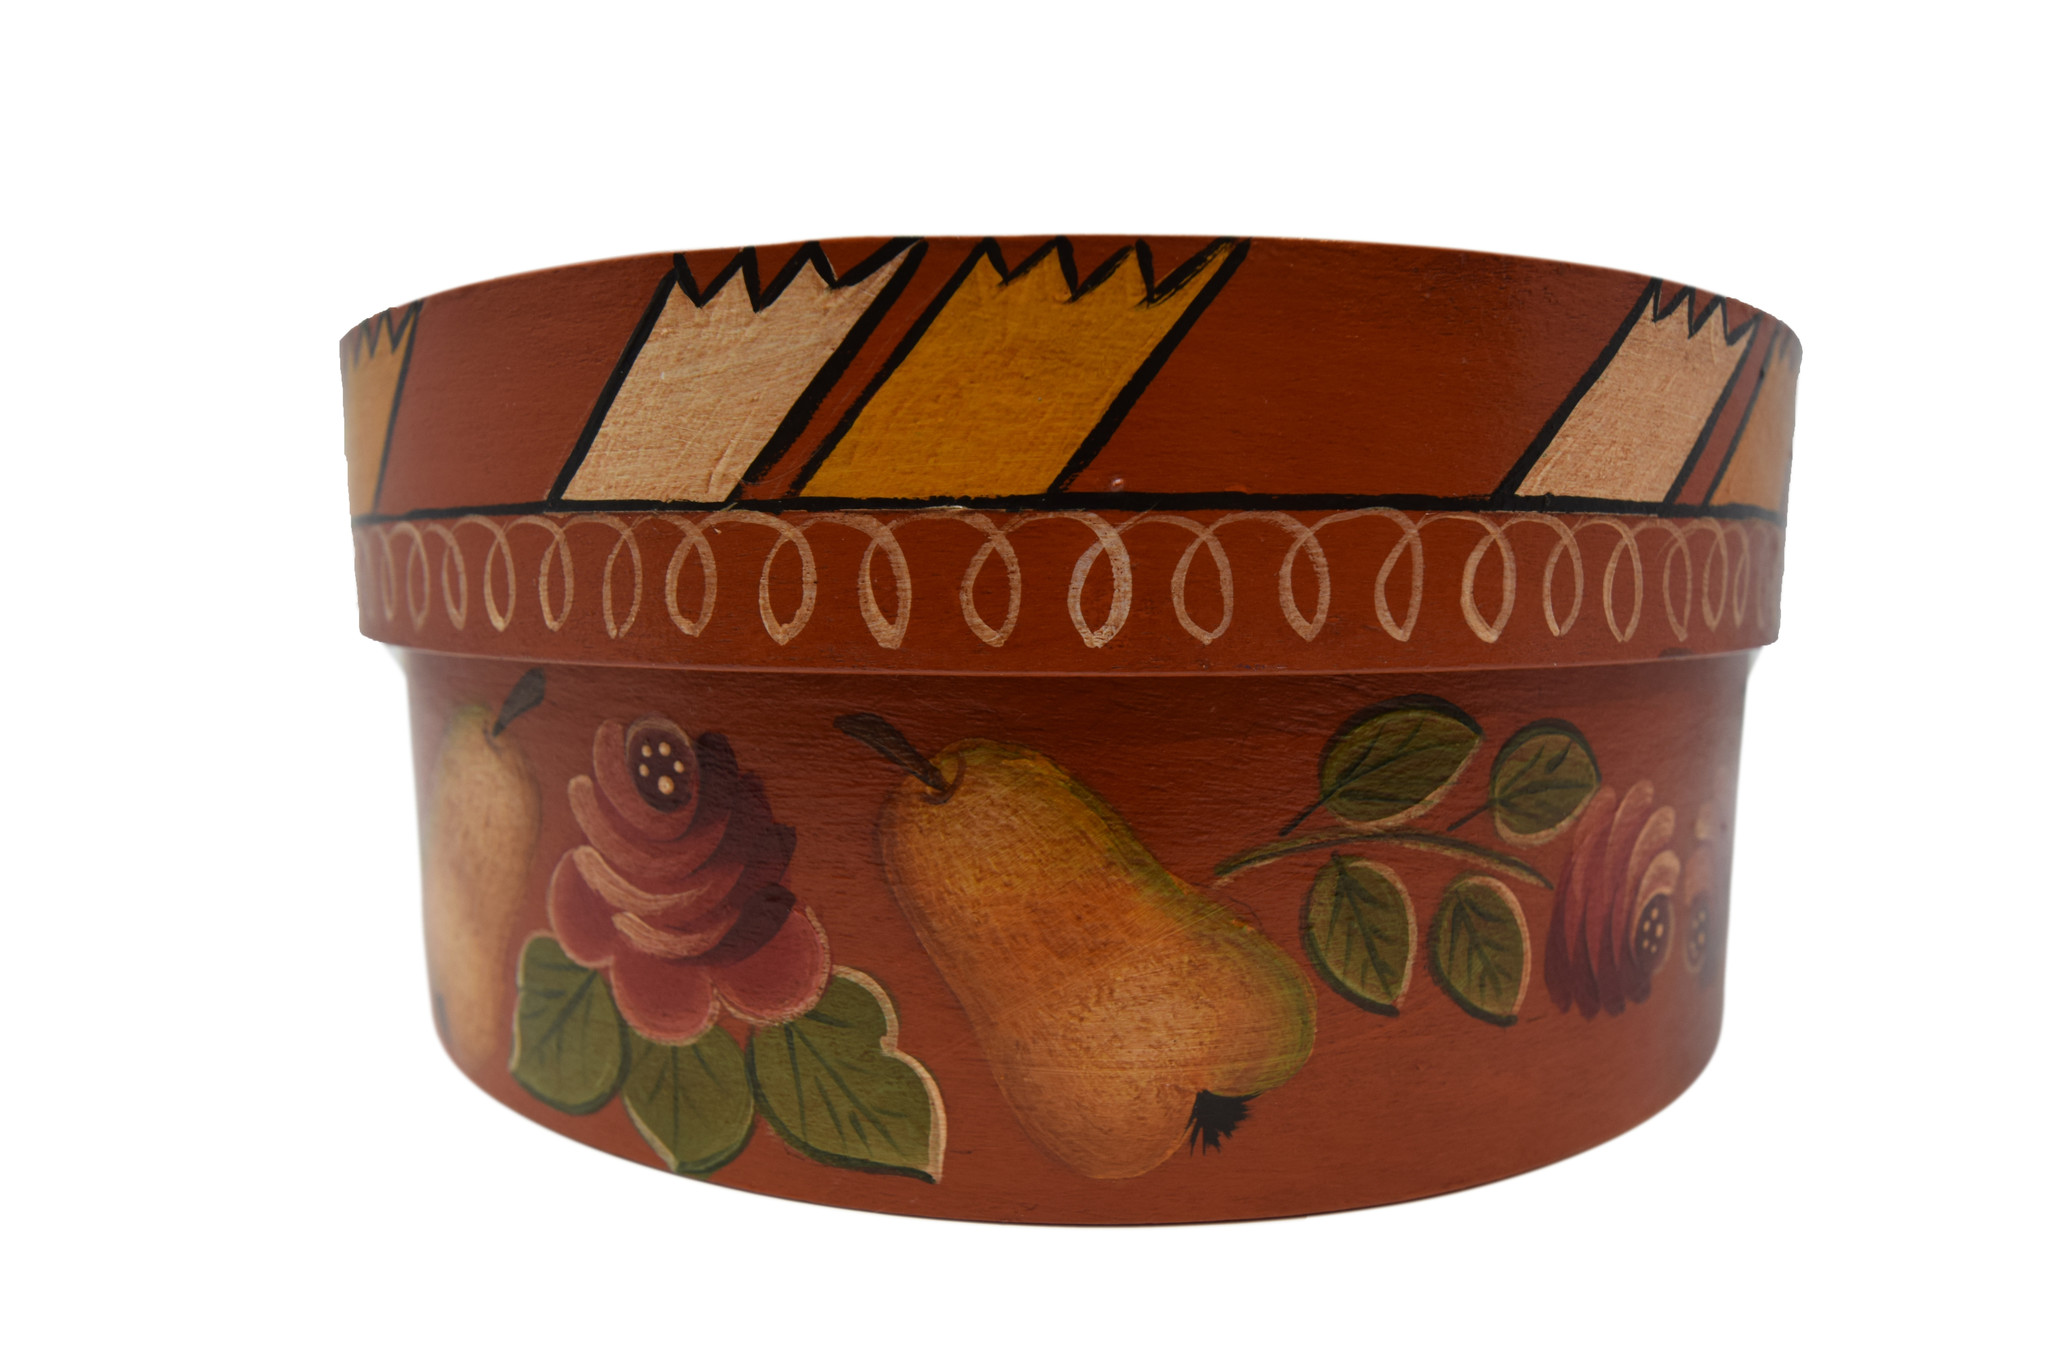 Round Box dark orange with basket, pears, and flowers-2